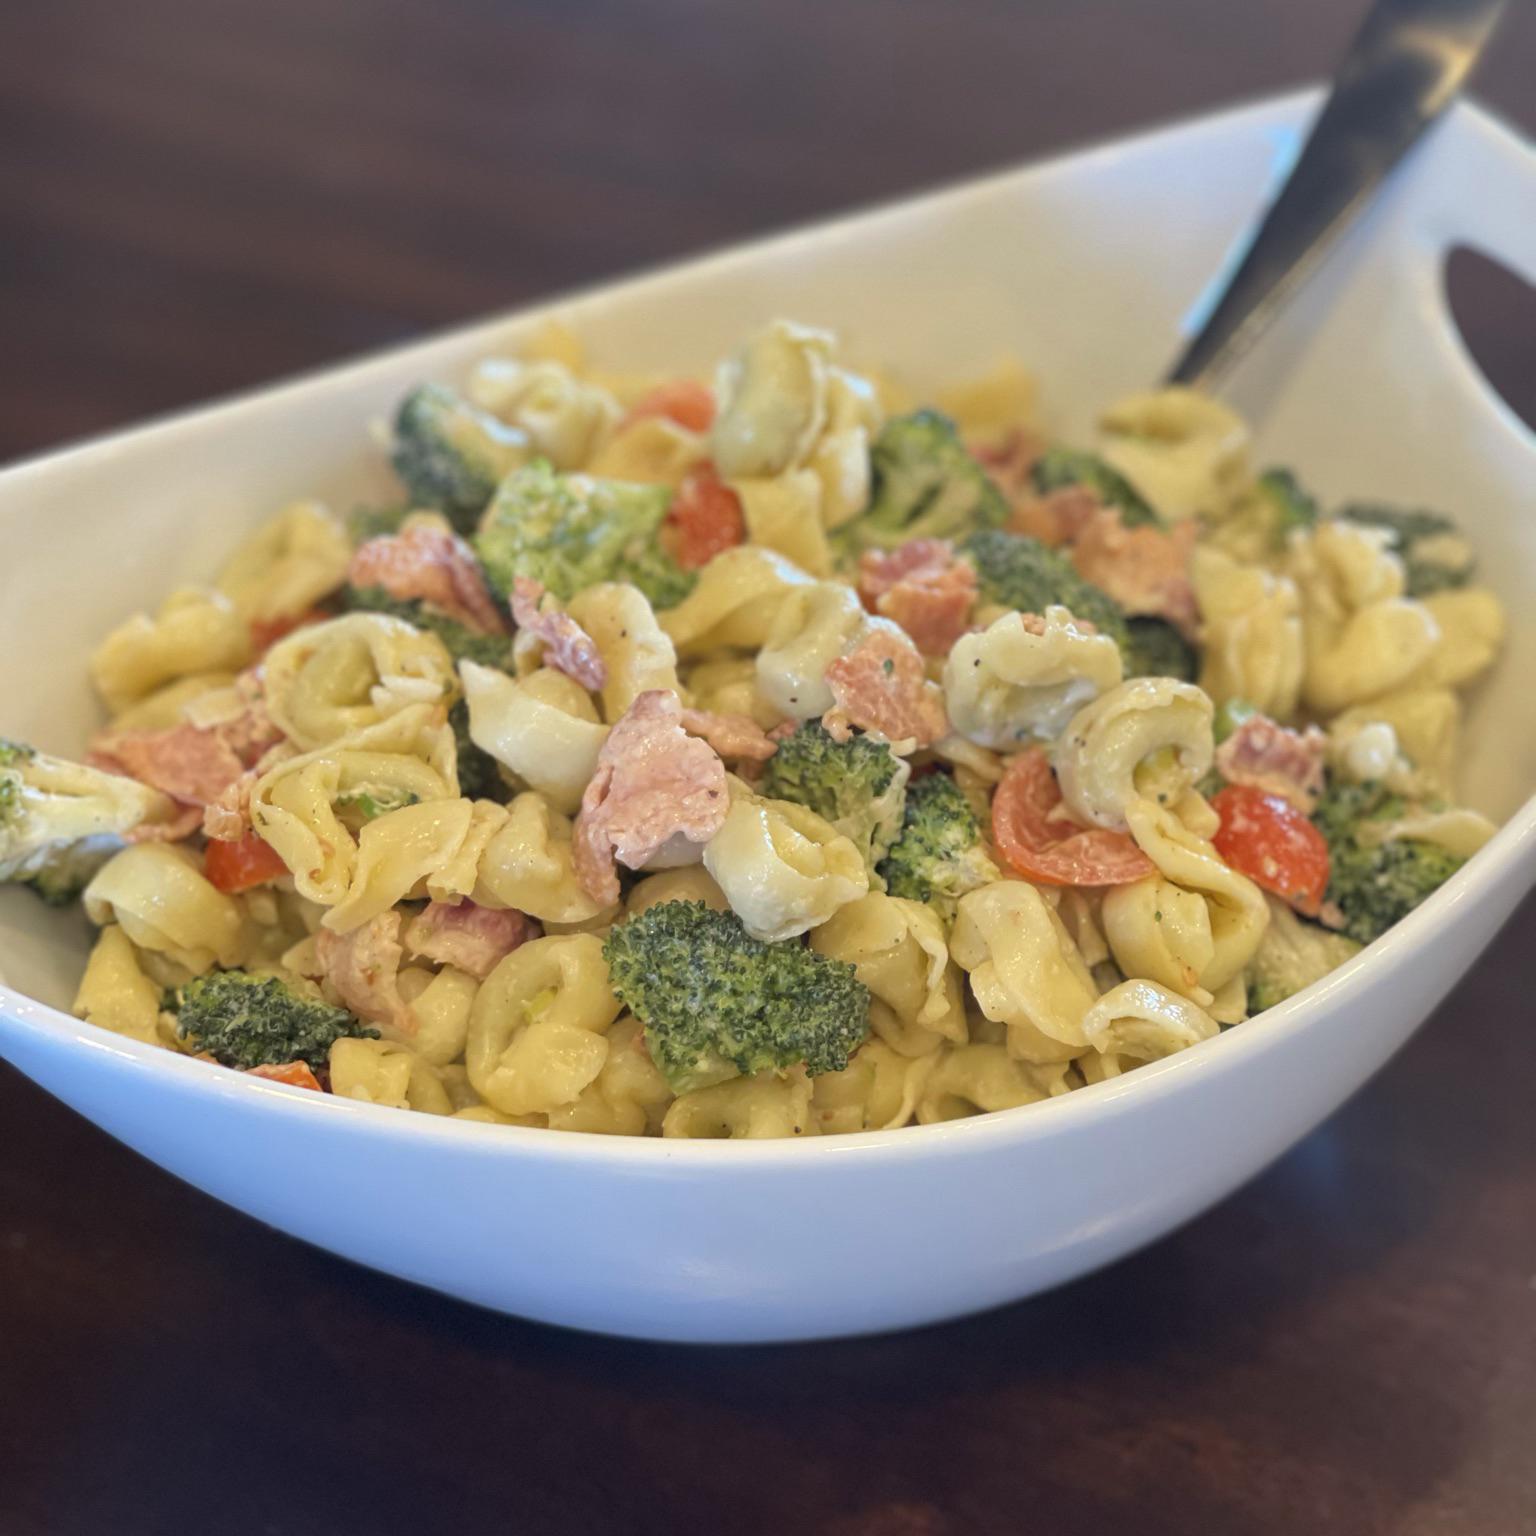 Barb's Broccoli-Cauliflower Salad ambieb14